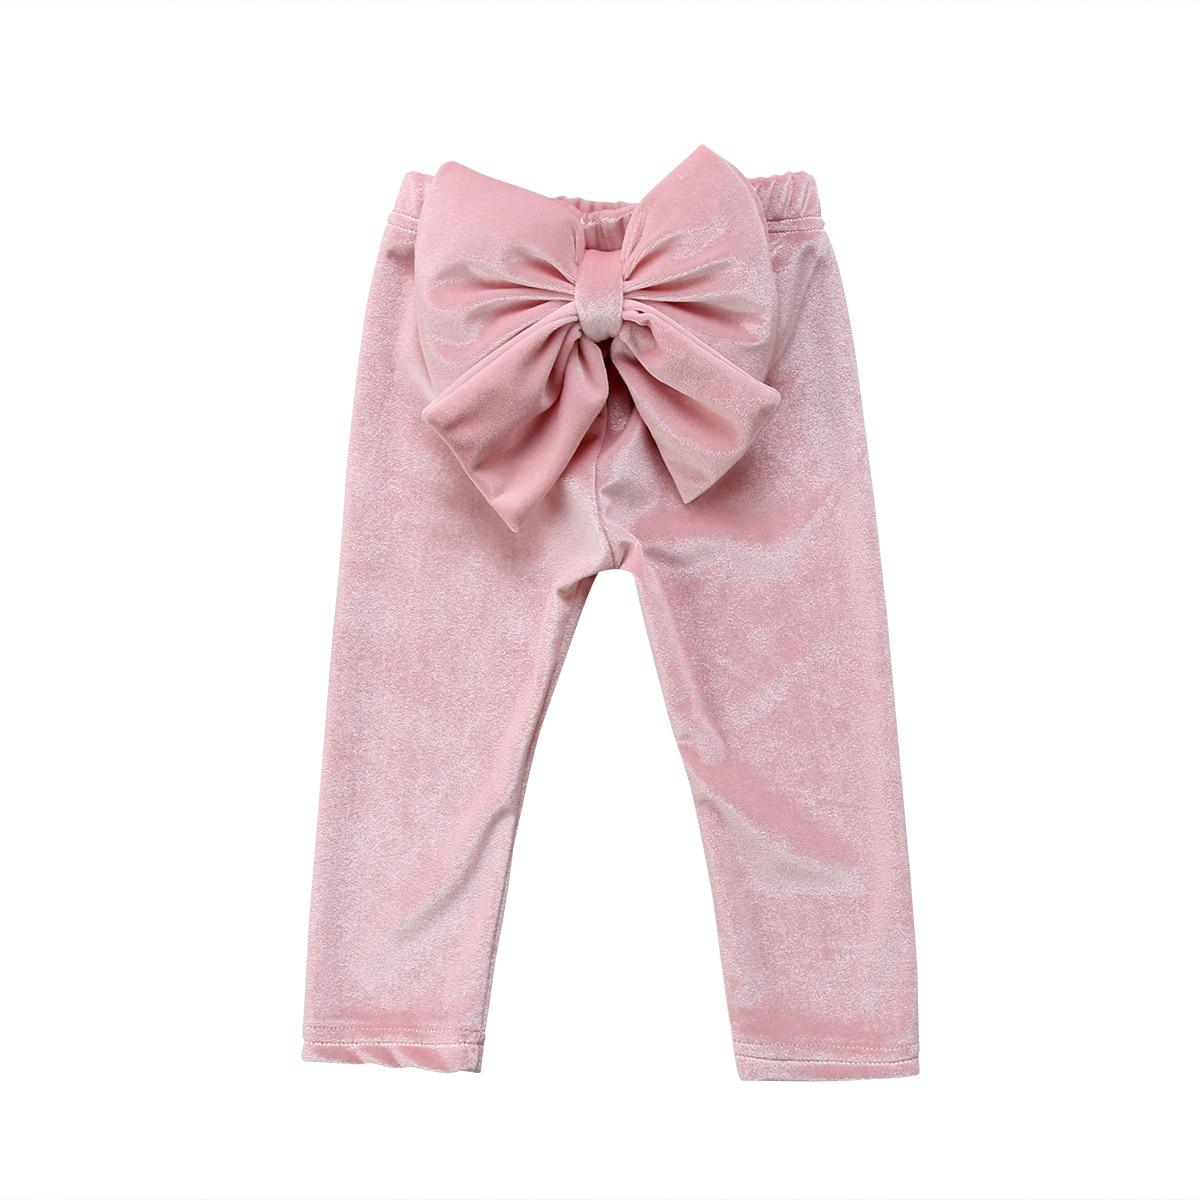 Toddler Newborn Baby Girls Loose Ruffle Lace Bowknot Harem Pants Leggings